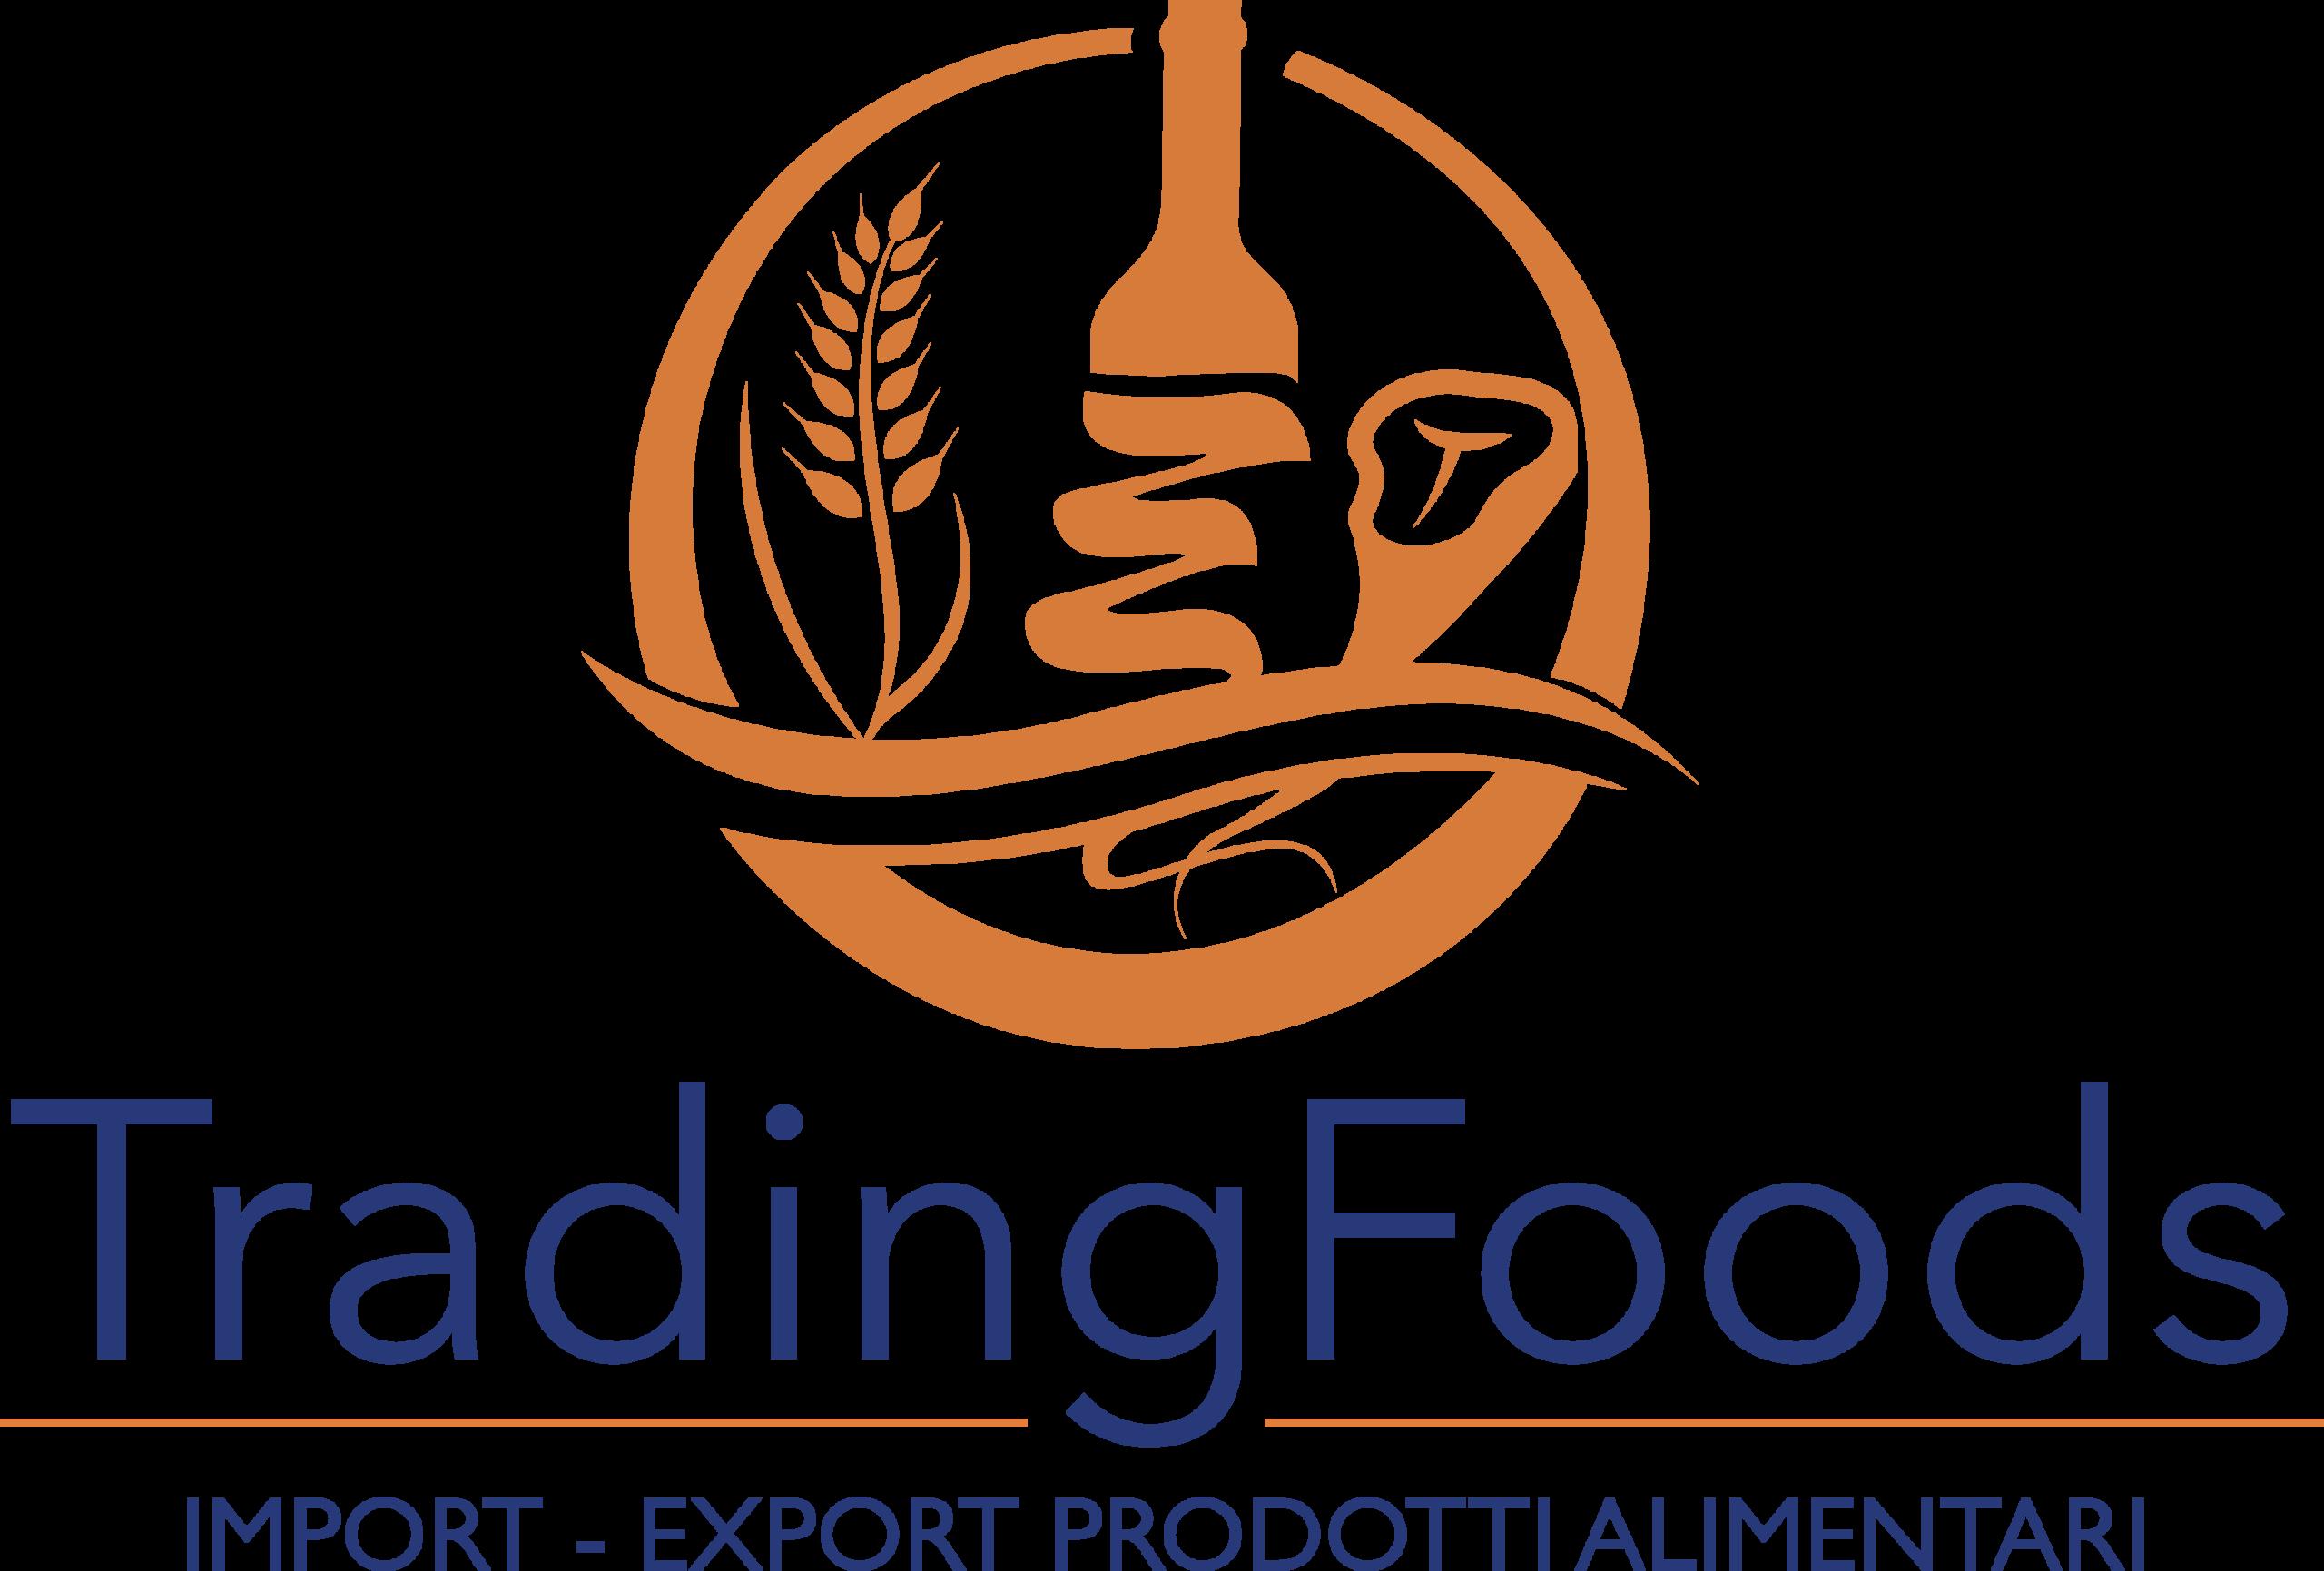 Tradingfoods